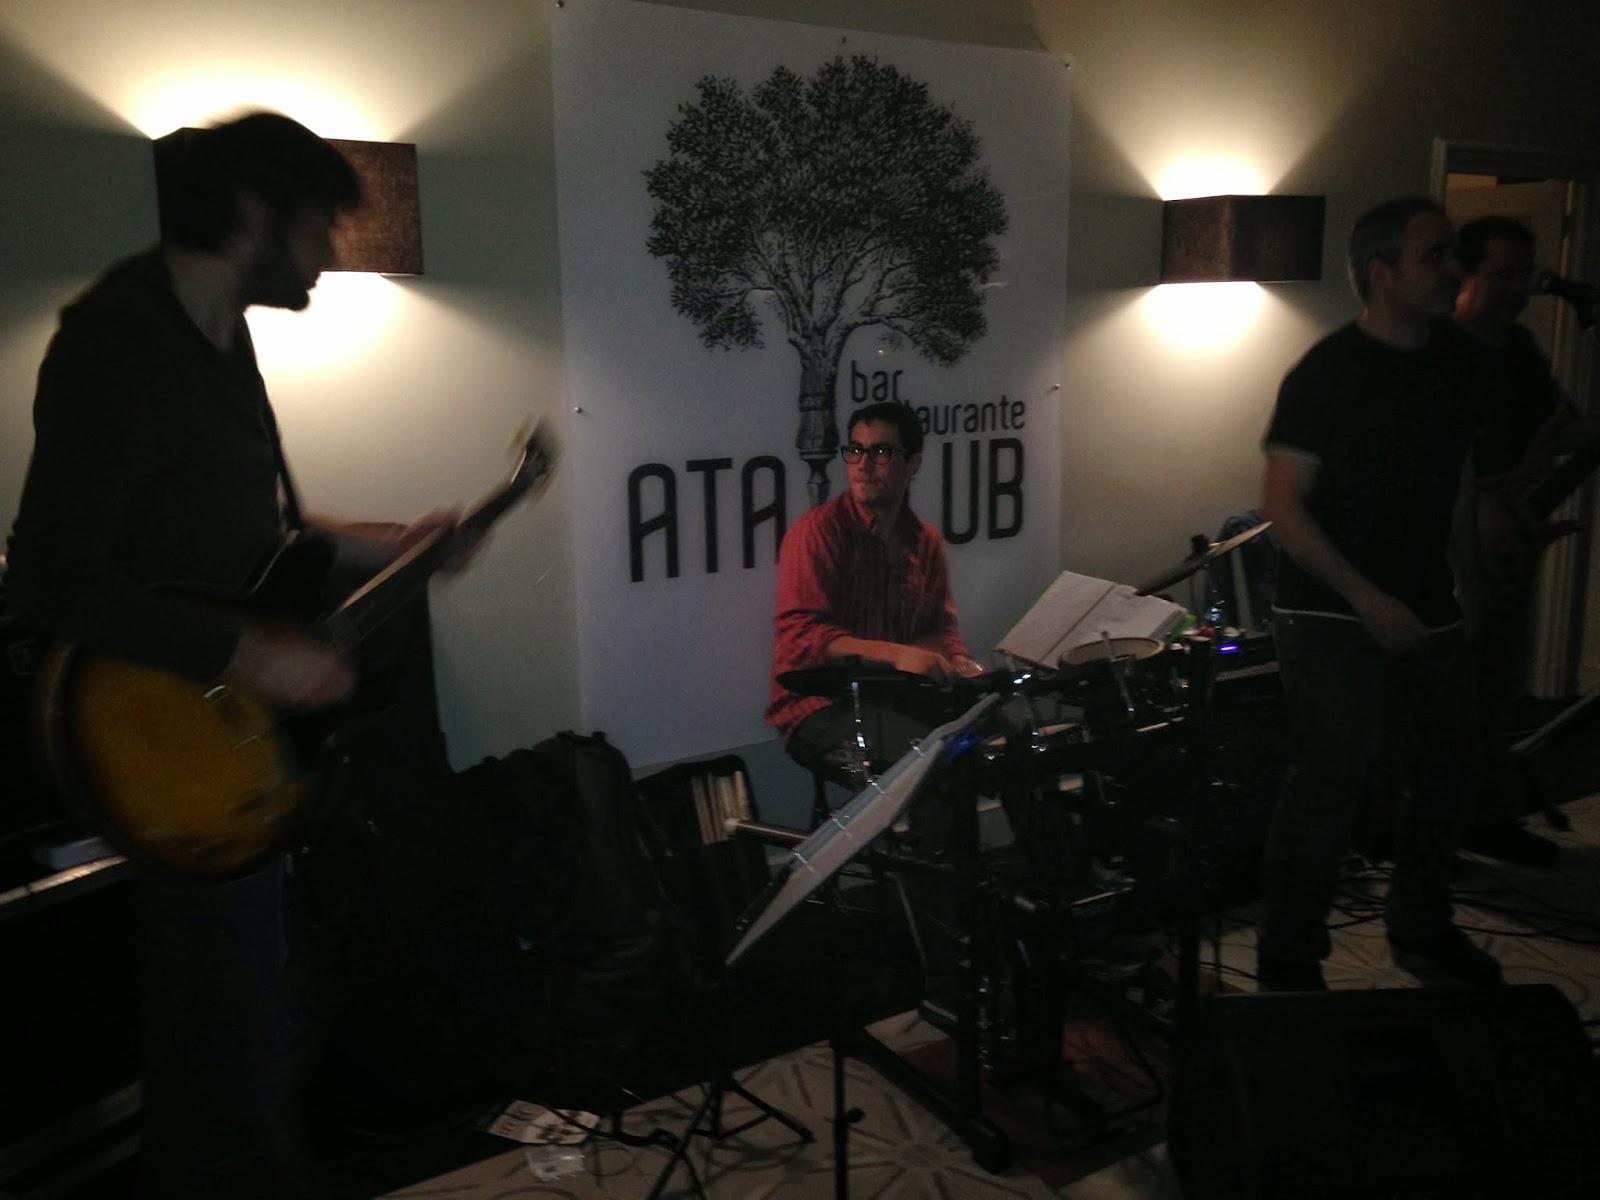 ATA club live performance